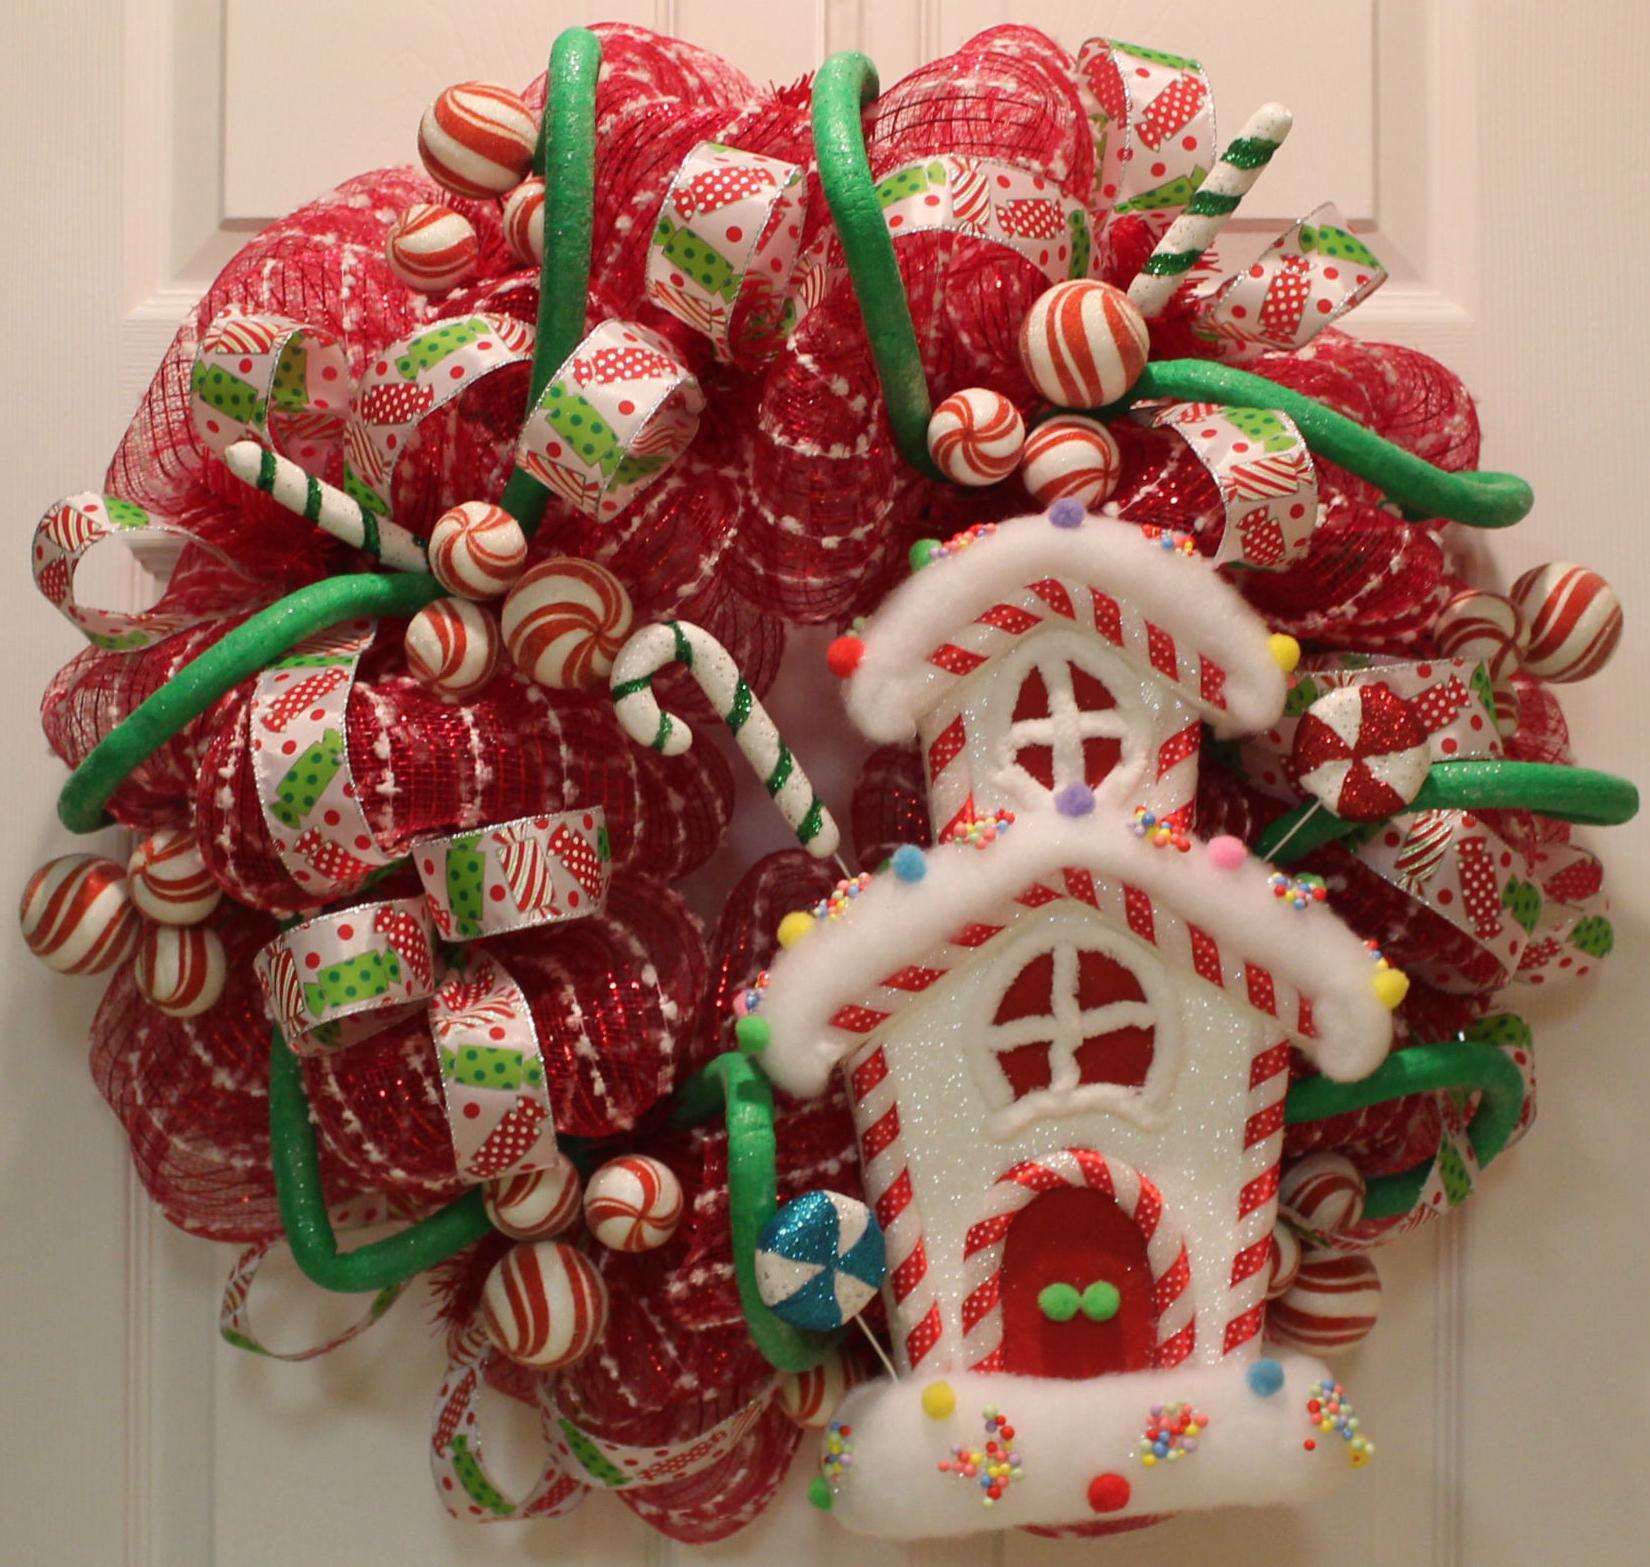 diy mesh holiday wreath tutorial candyland - Deco Mesh Christmas Wreath